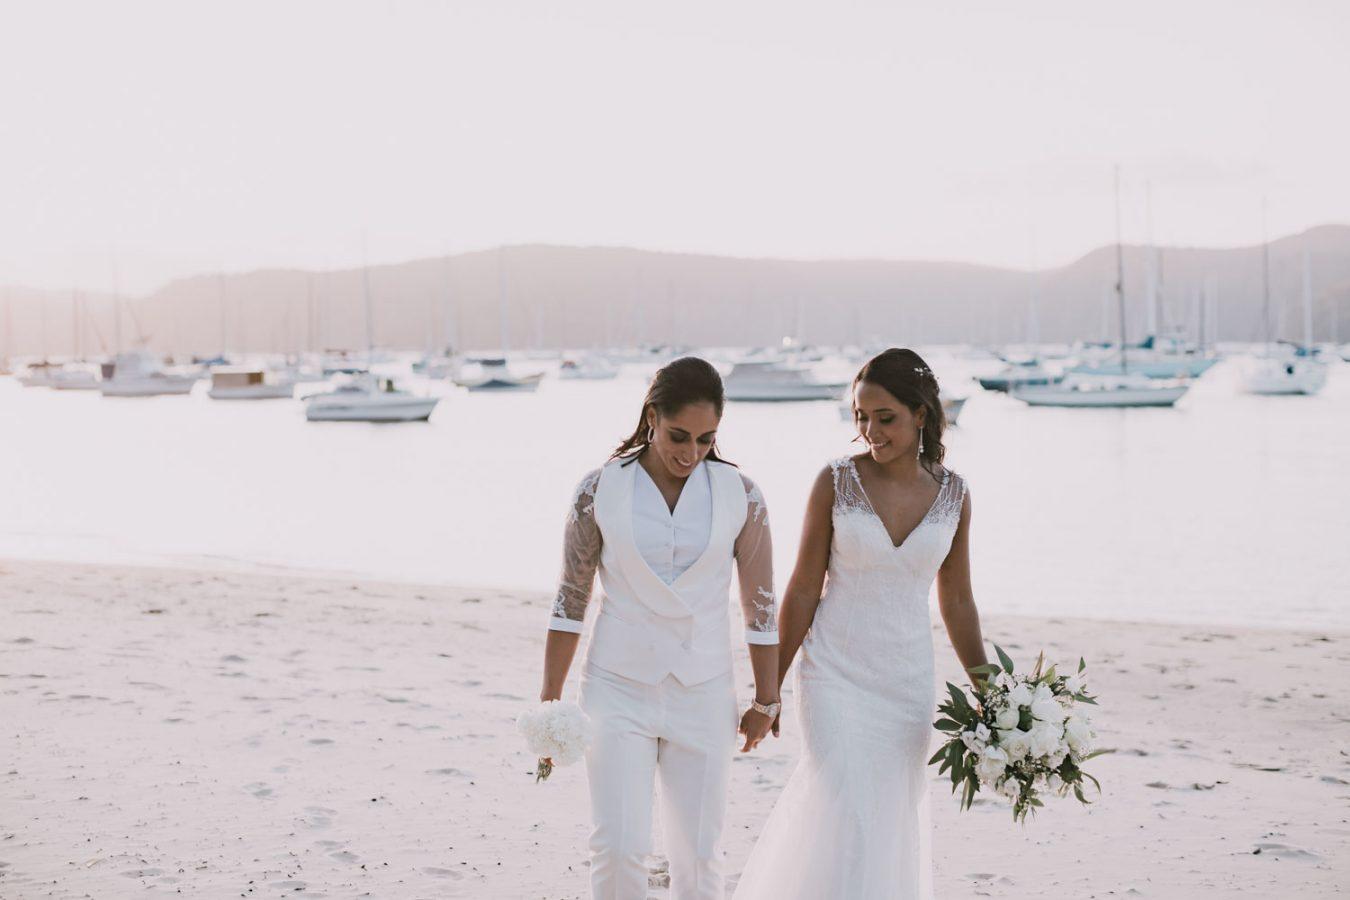 Beach House Avalon Wedding Ness Mel Kat Rollings Photography-0095